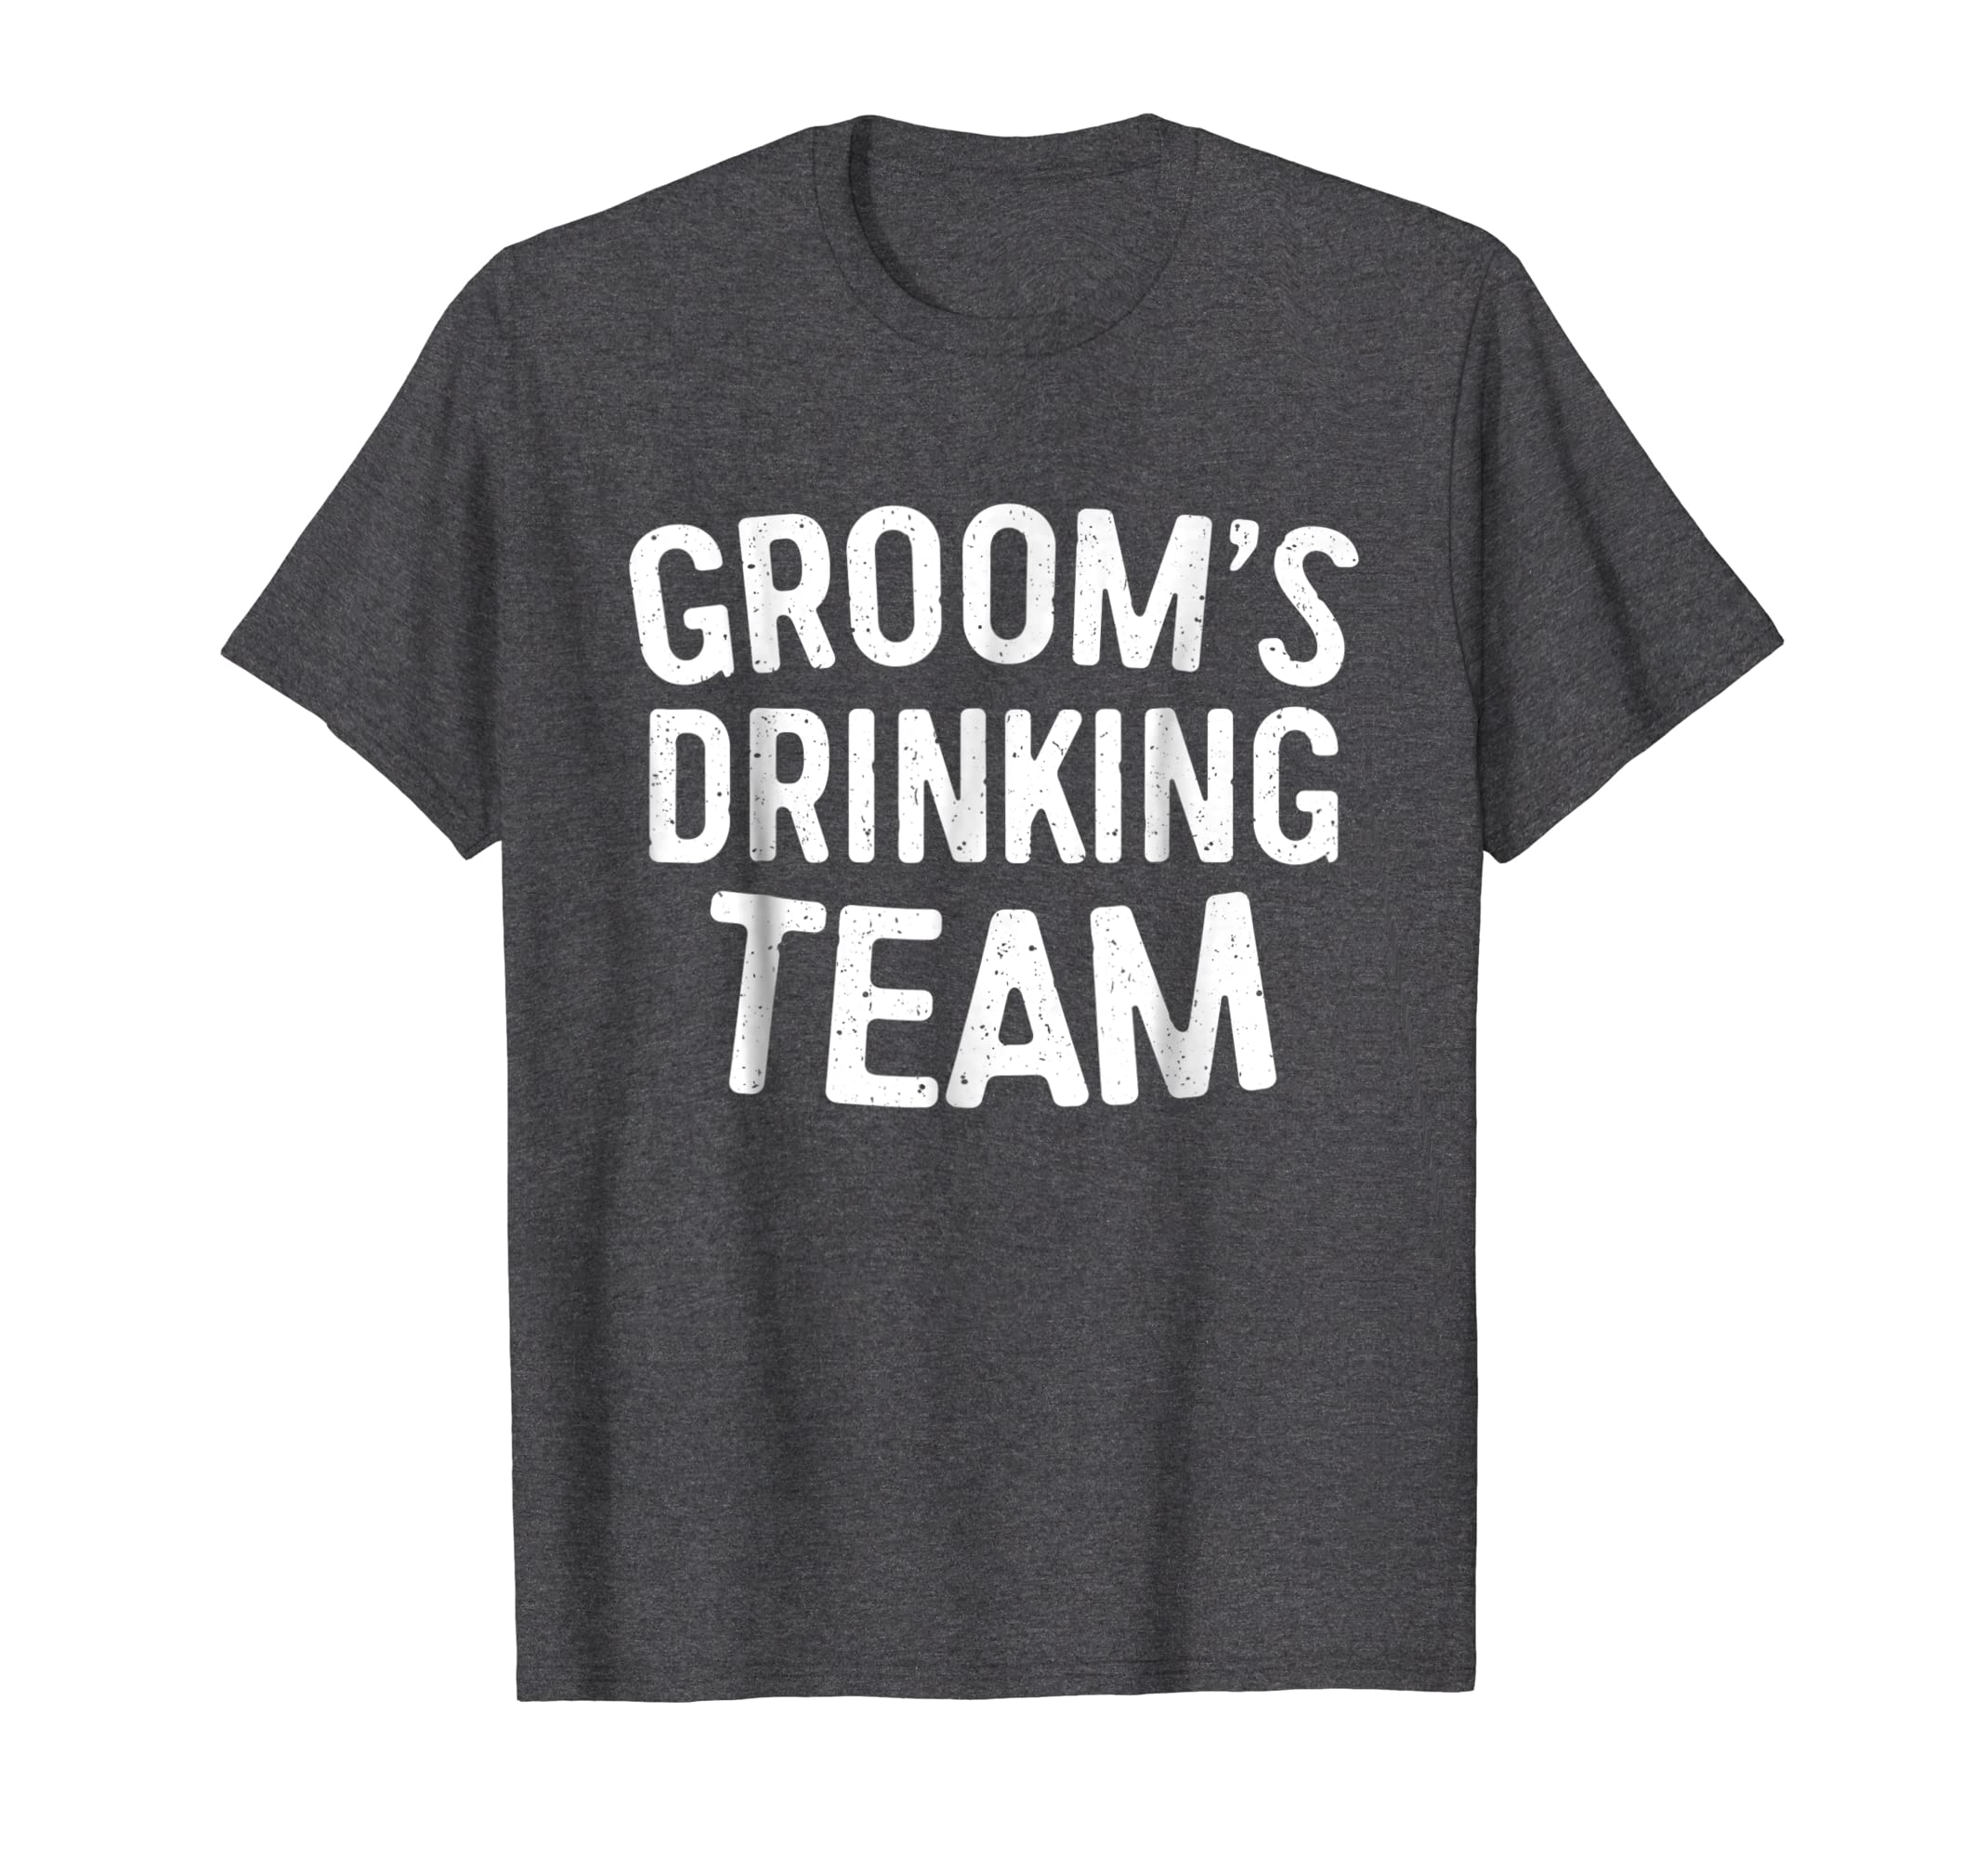 f2ba7679 Amazon.com: Mens Groom's Drinking Team T-Shirt Bachelor Party Gift: Clothing